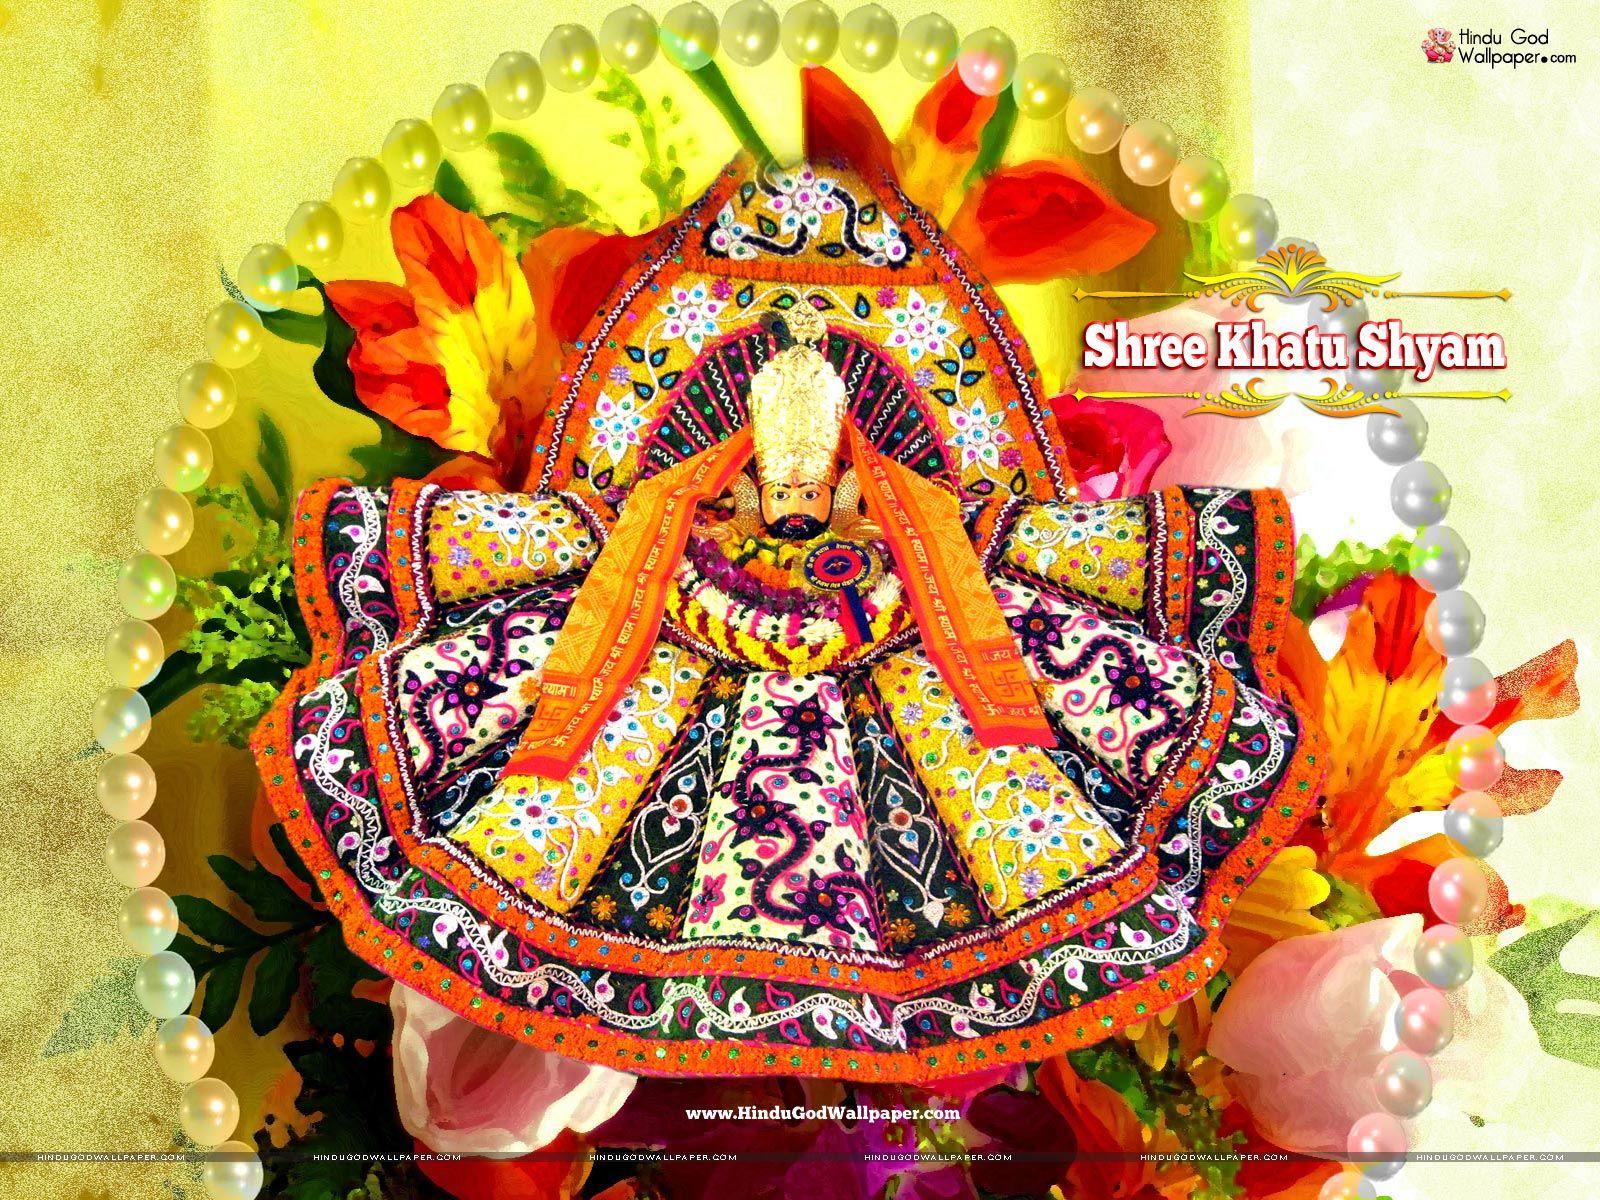 Khatu Shyam Khatu Shyam Images Wallpaper Wallpaper Downloads Free